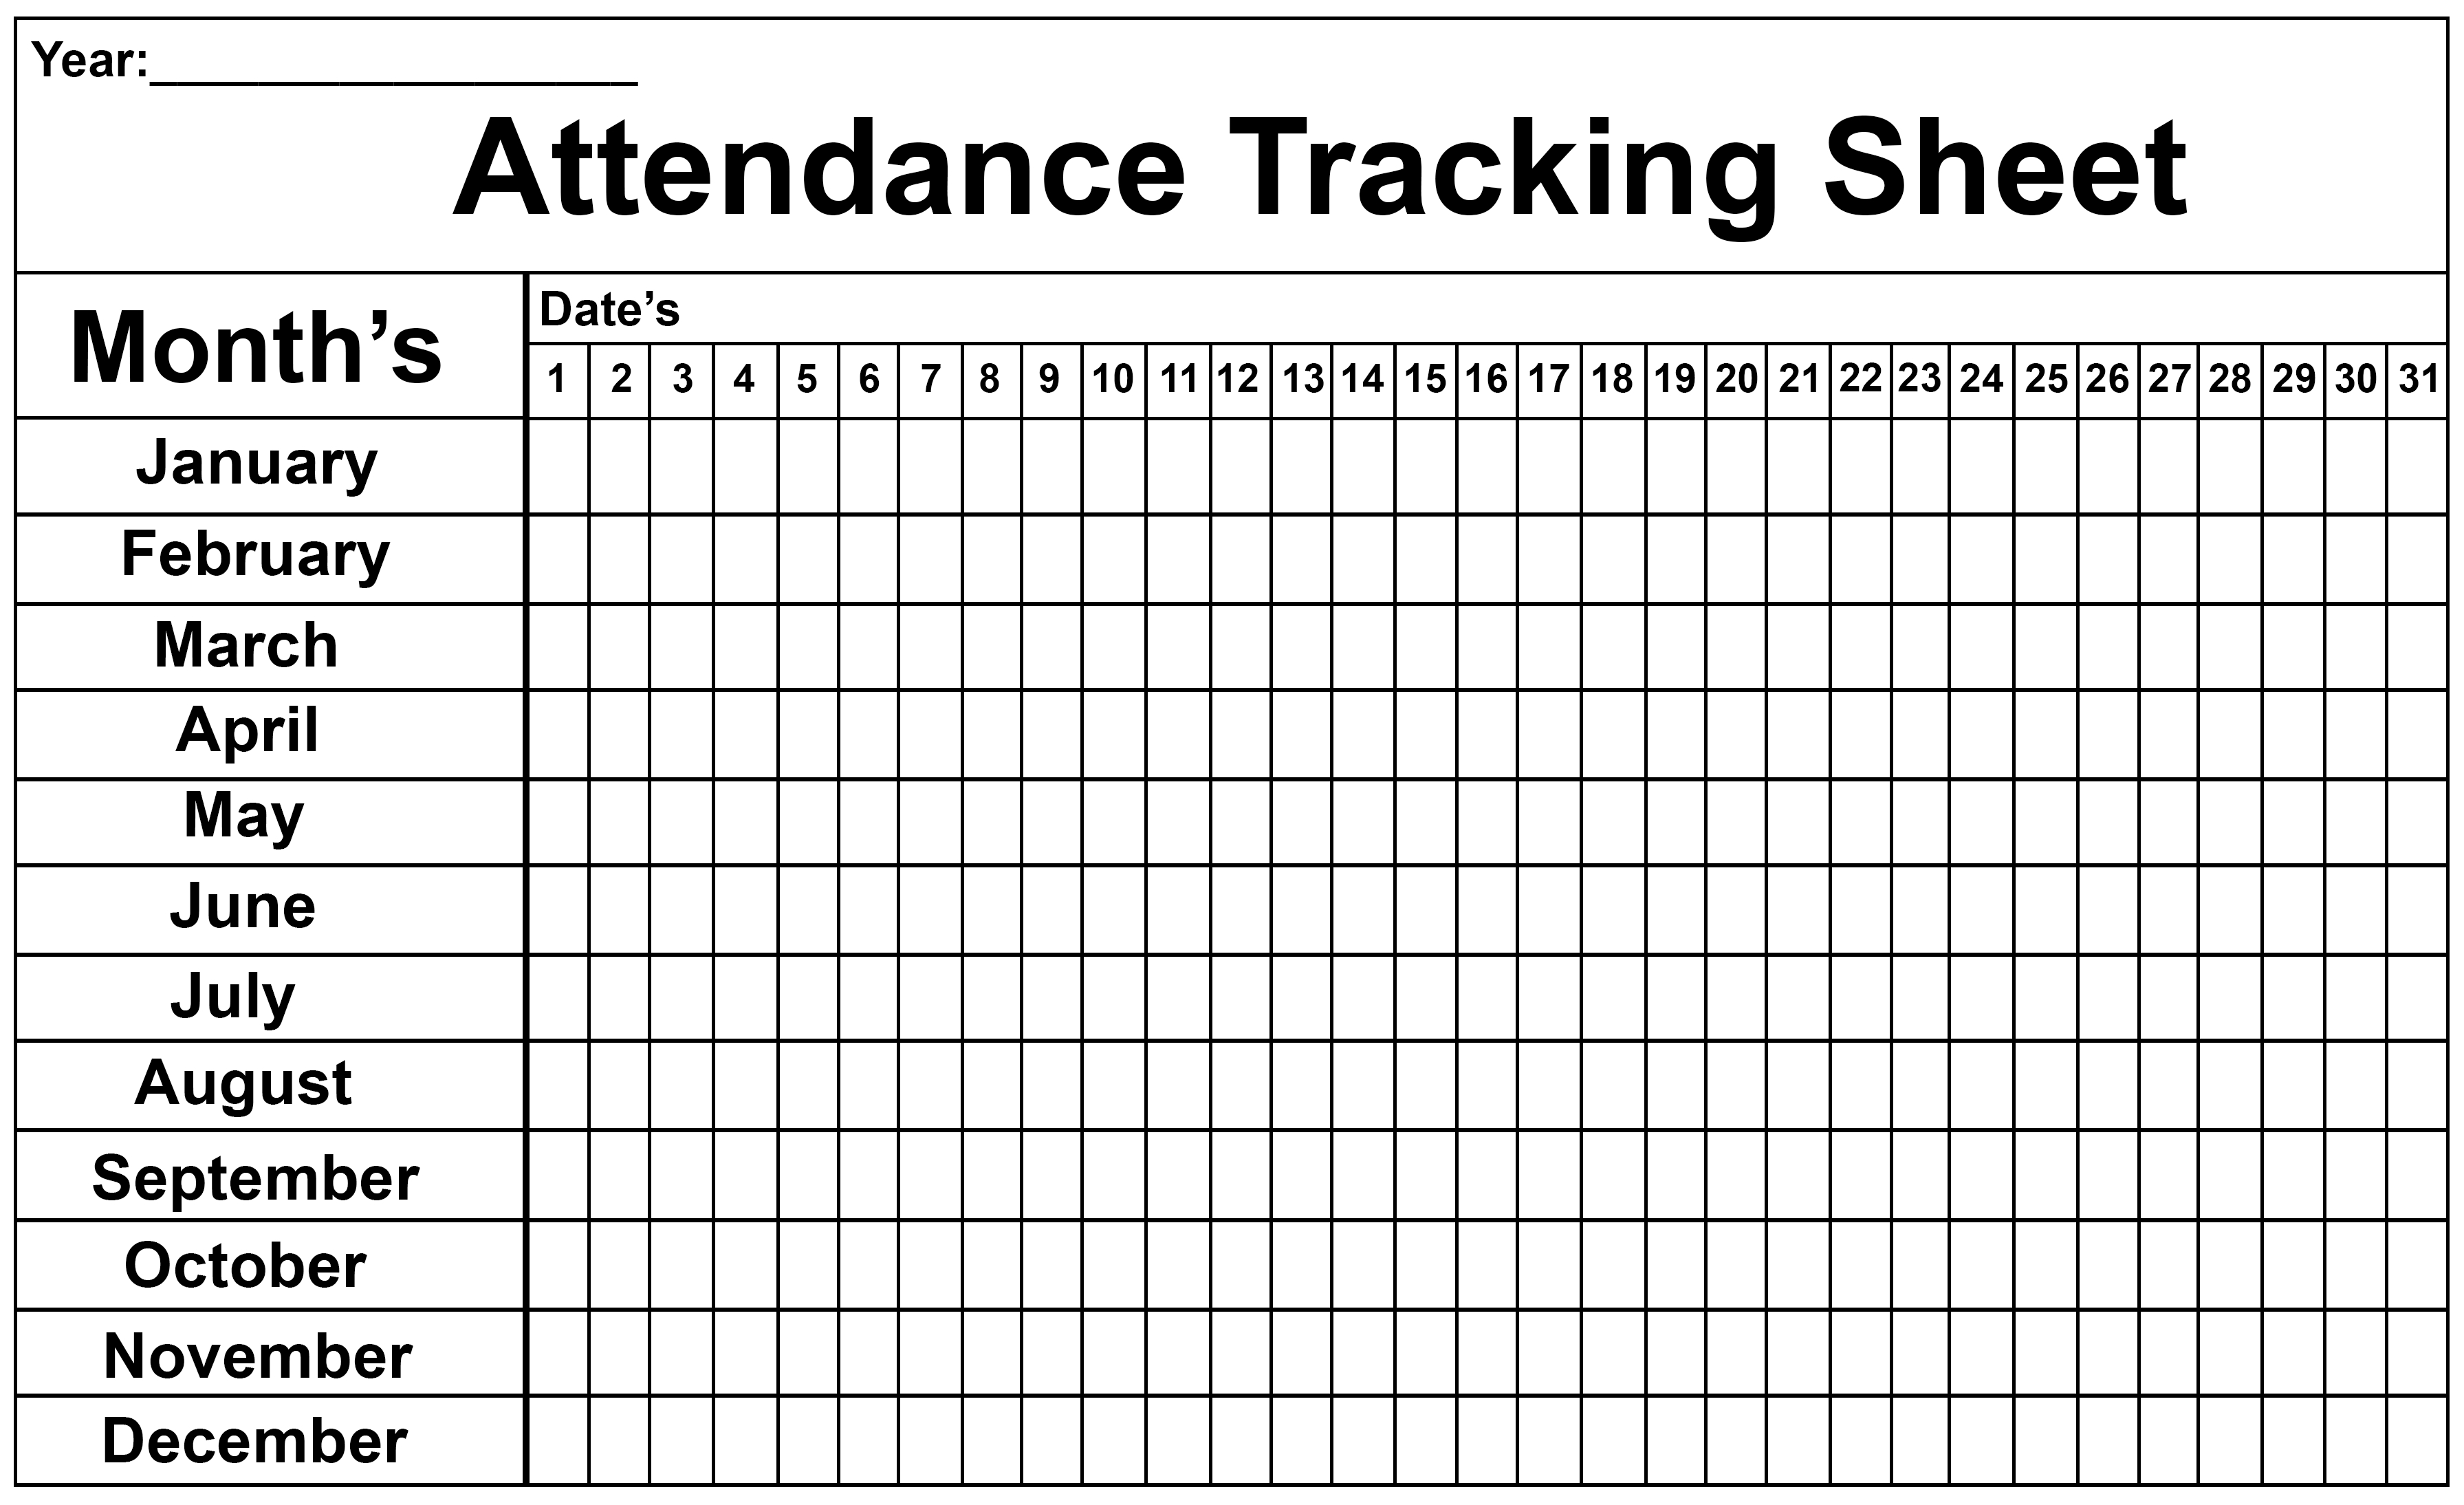 Employee Attendance Tracker Sheet 2019 | Printable Calendar Diy intended for Free Printable 2020 Employee Attendance Calendar